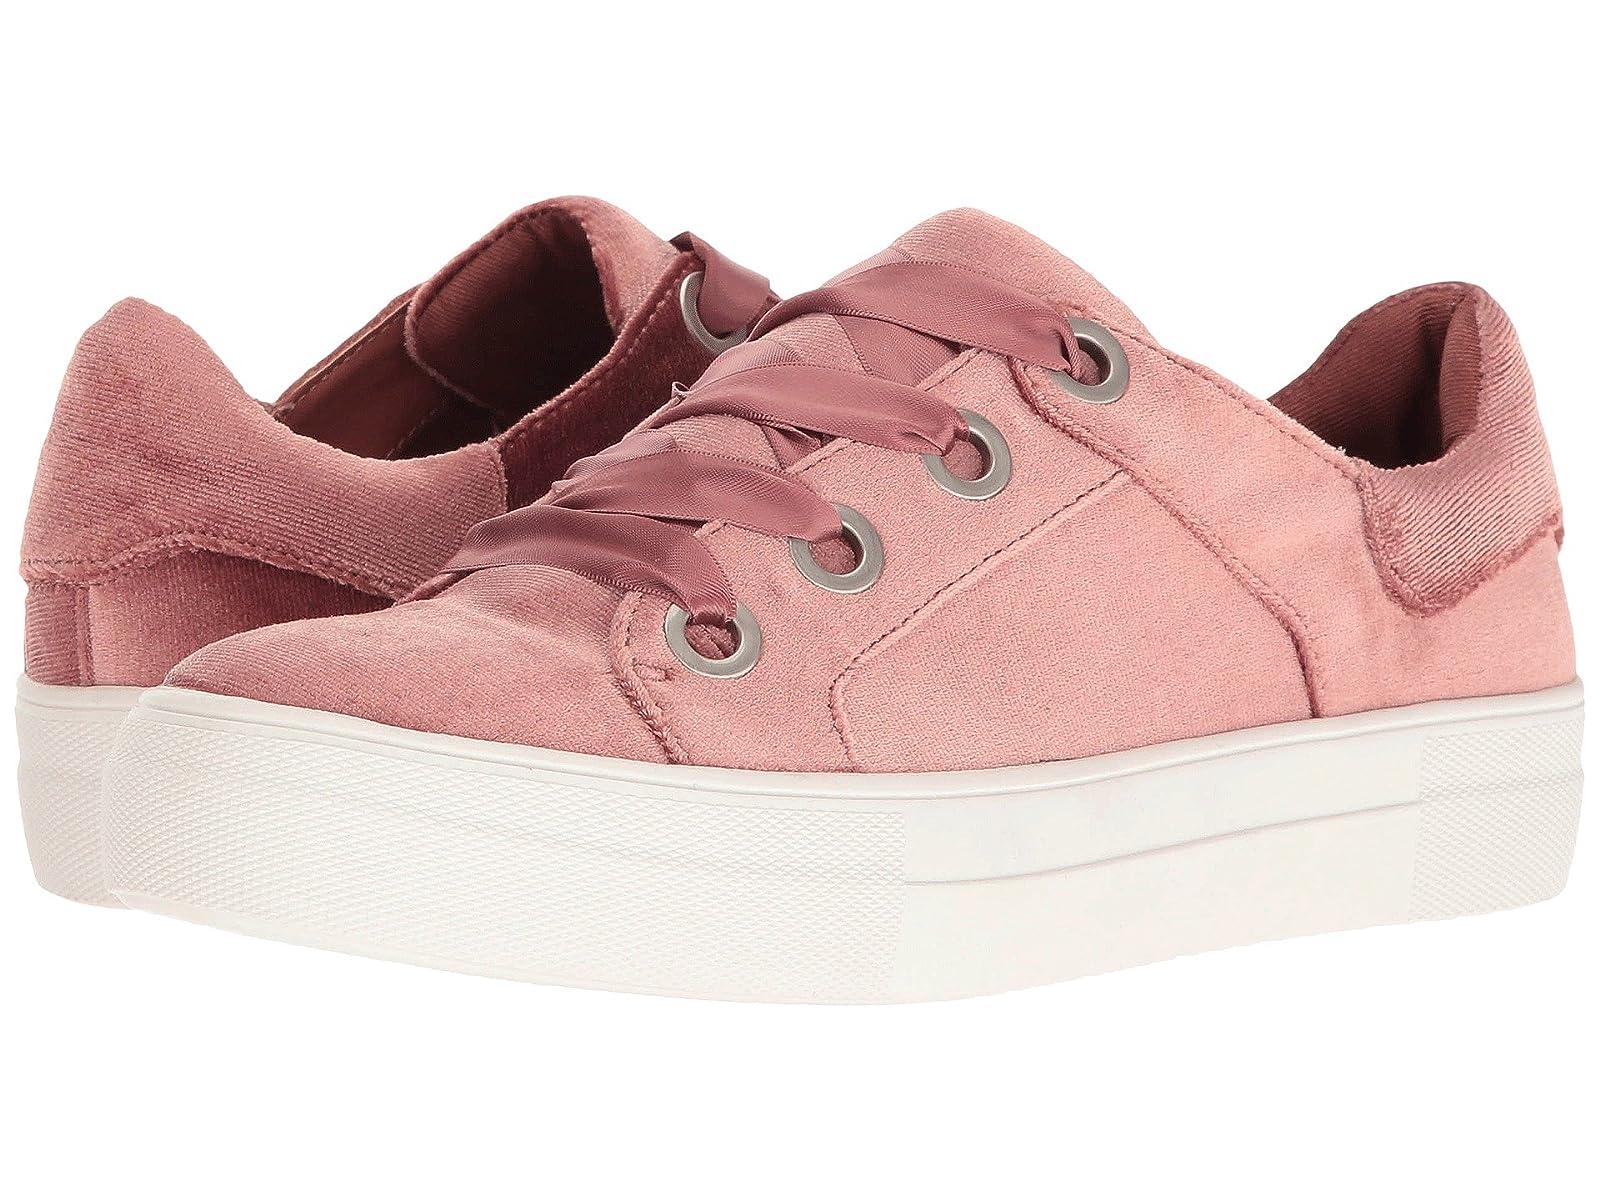 Steven GatorCheap and distinctive eye-catching shoes